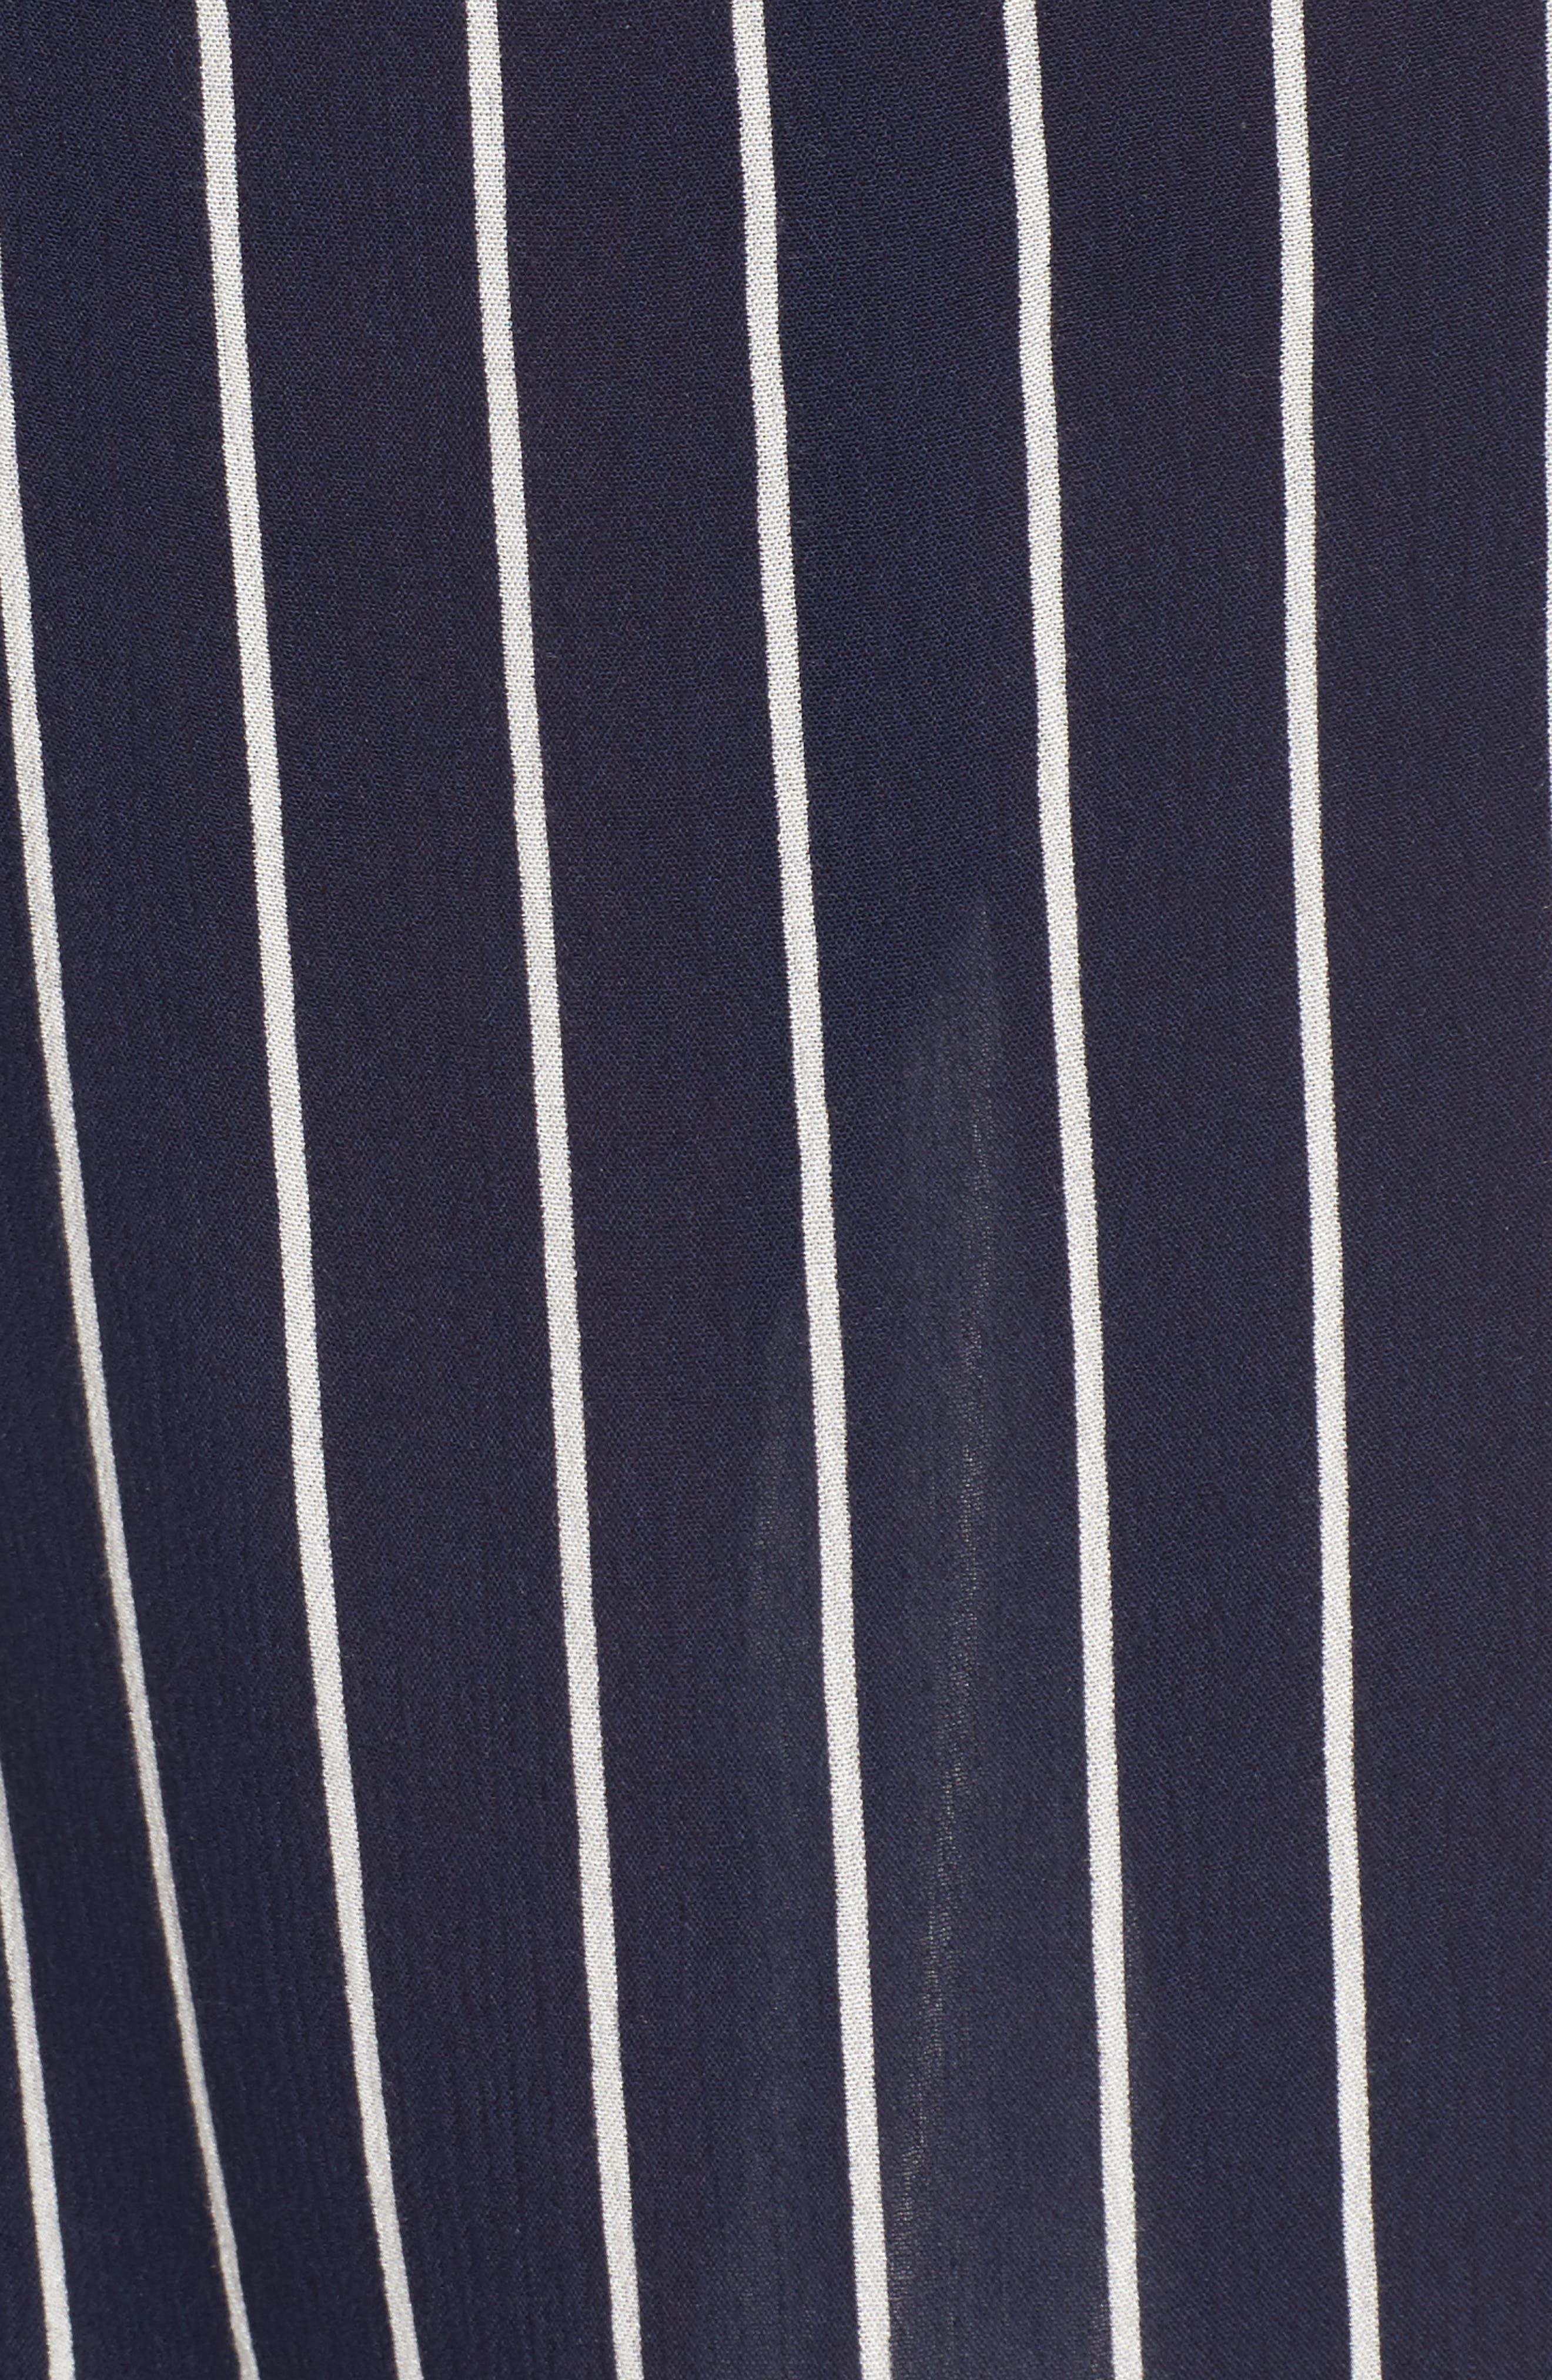 So Right Stripe Faux Wrap Skirt,                             Alternate thumbnail 6, color,                             Deep Sea